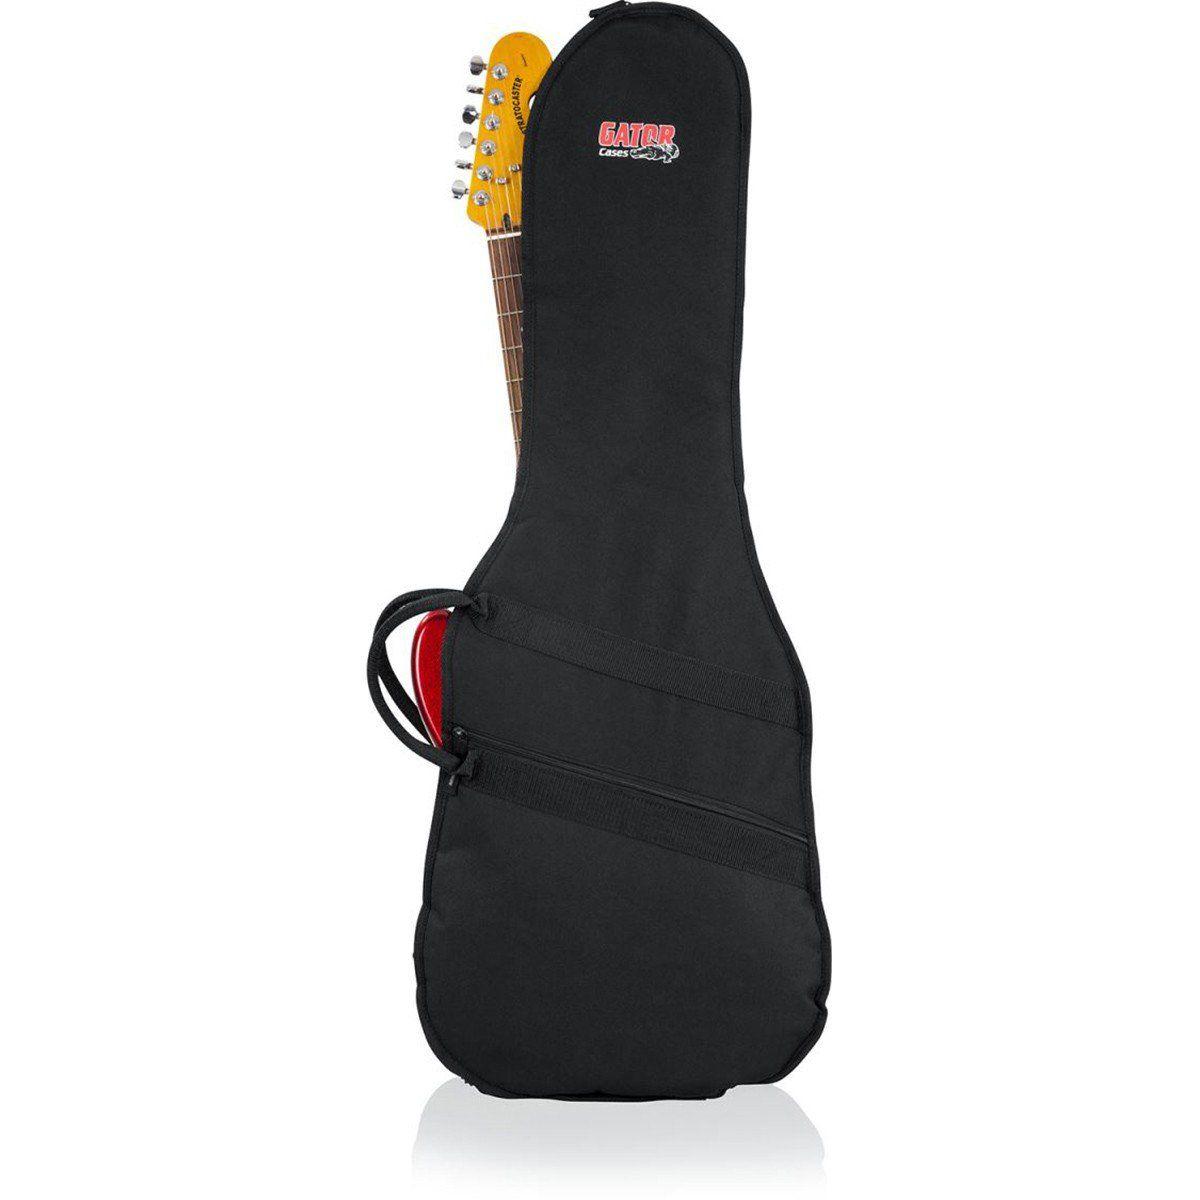 Gator GBE-Elect Bag Gator GBE Elect para Guitarra Elétrica